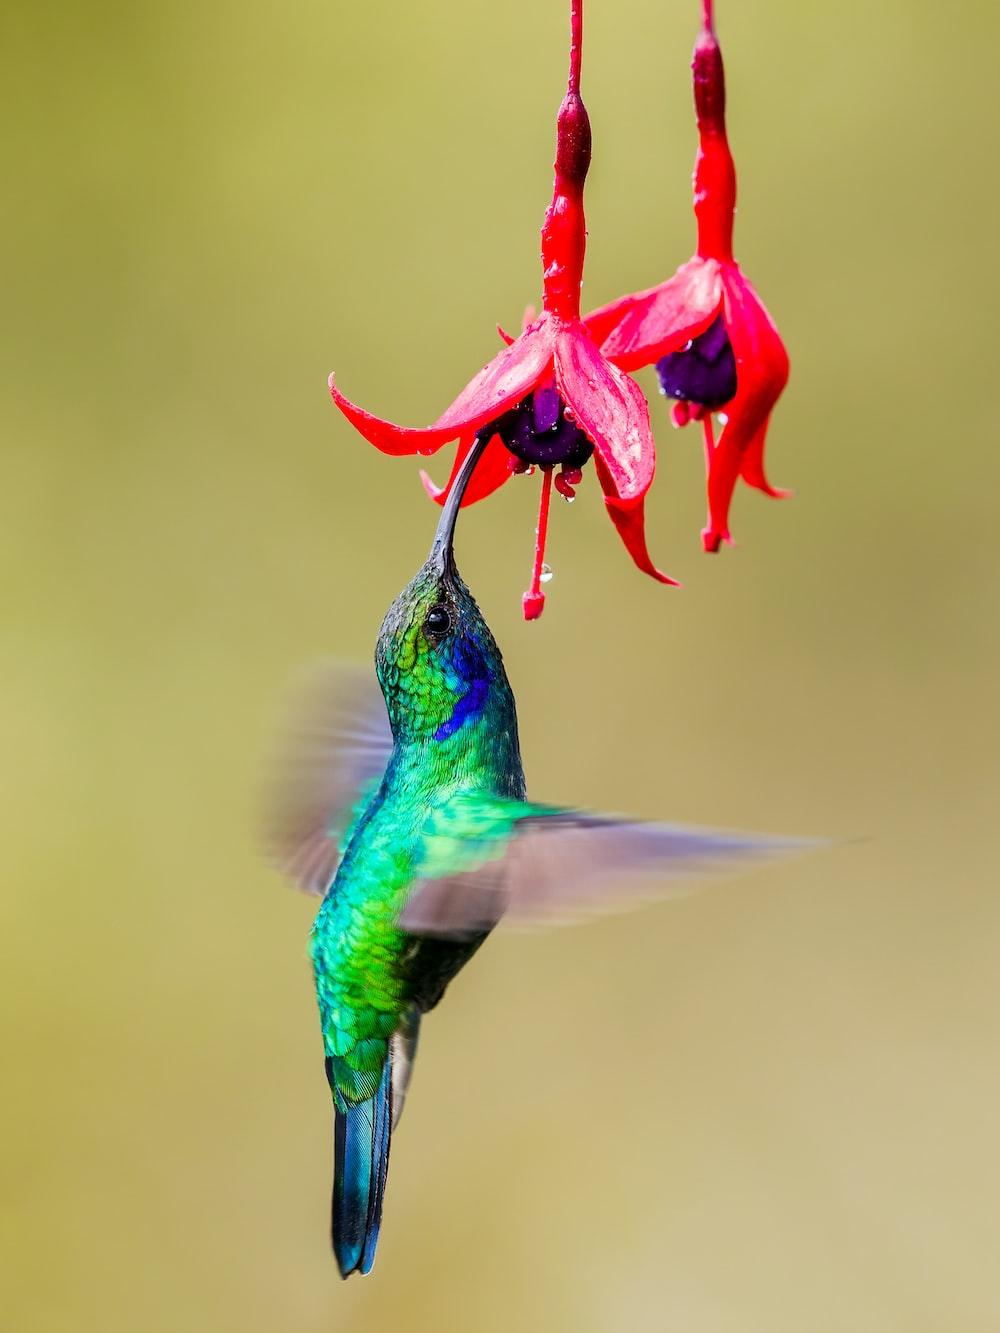 green and black humming bird flying